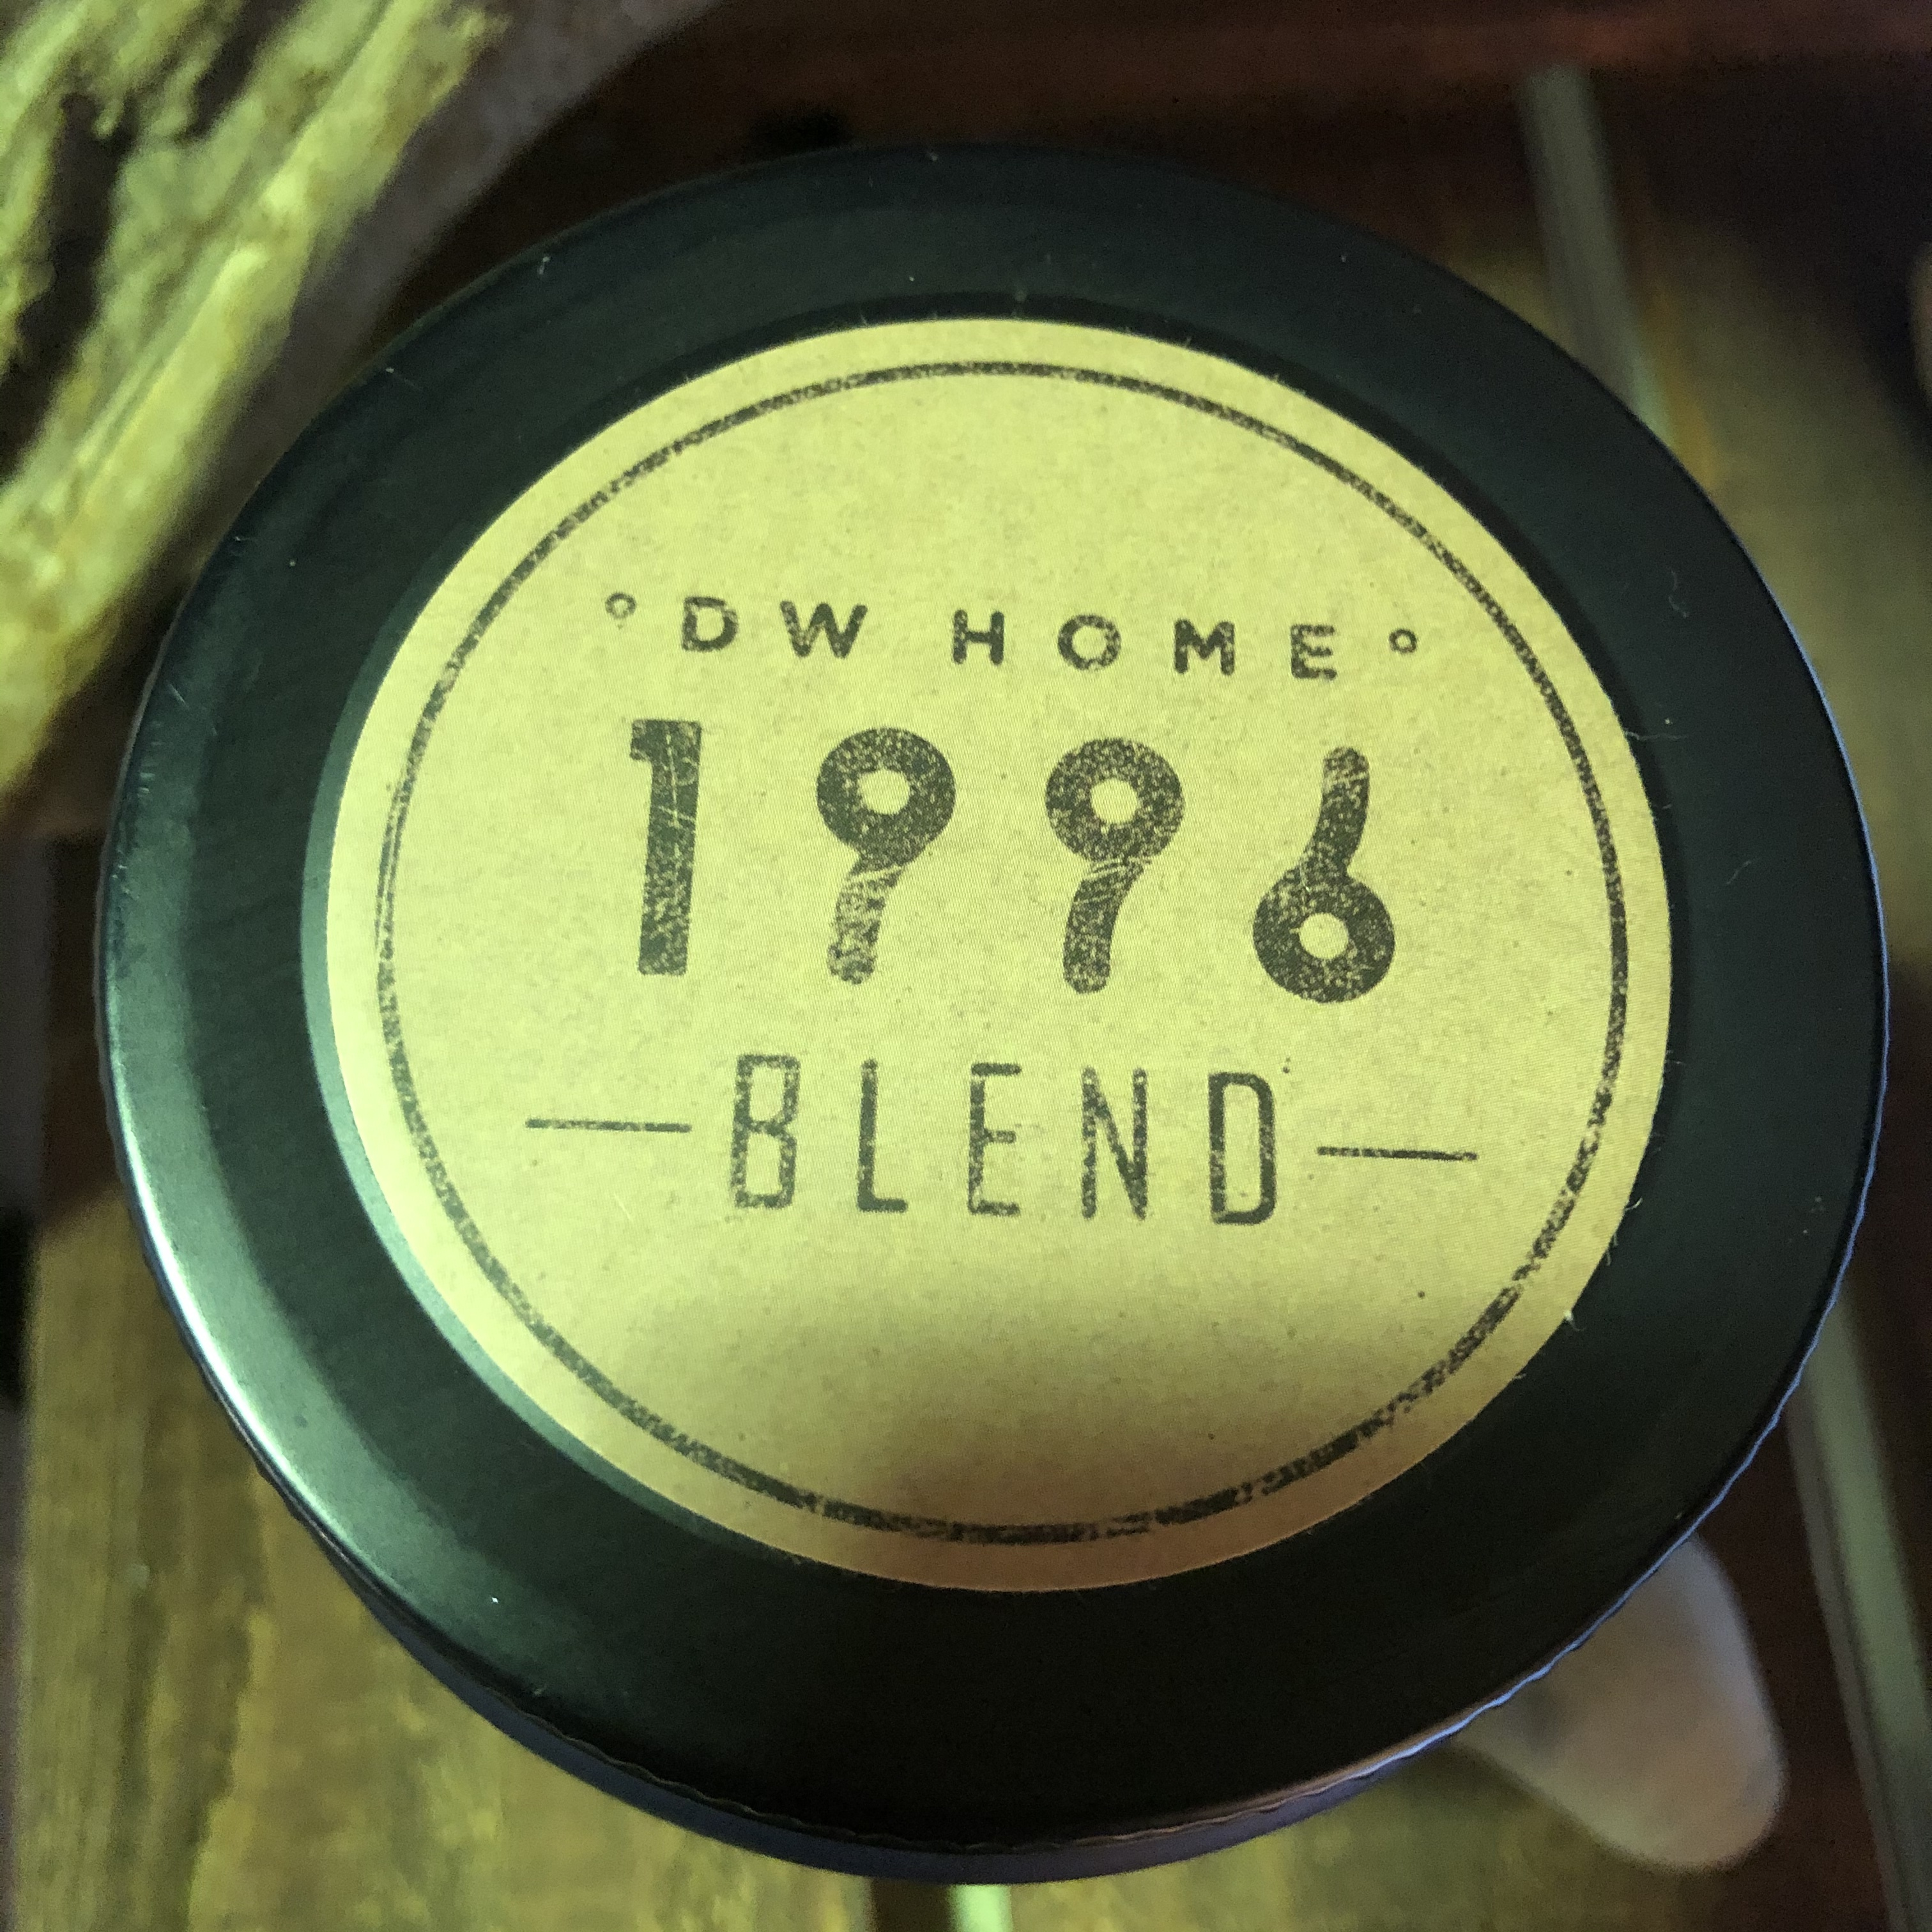 DW Home Candles 1996 BLEND 【OCEAN DRIFT WOOD BLEND】海と流木の香りが際立つアロマキャンドル